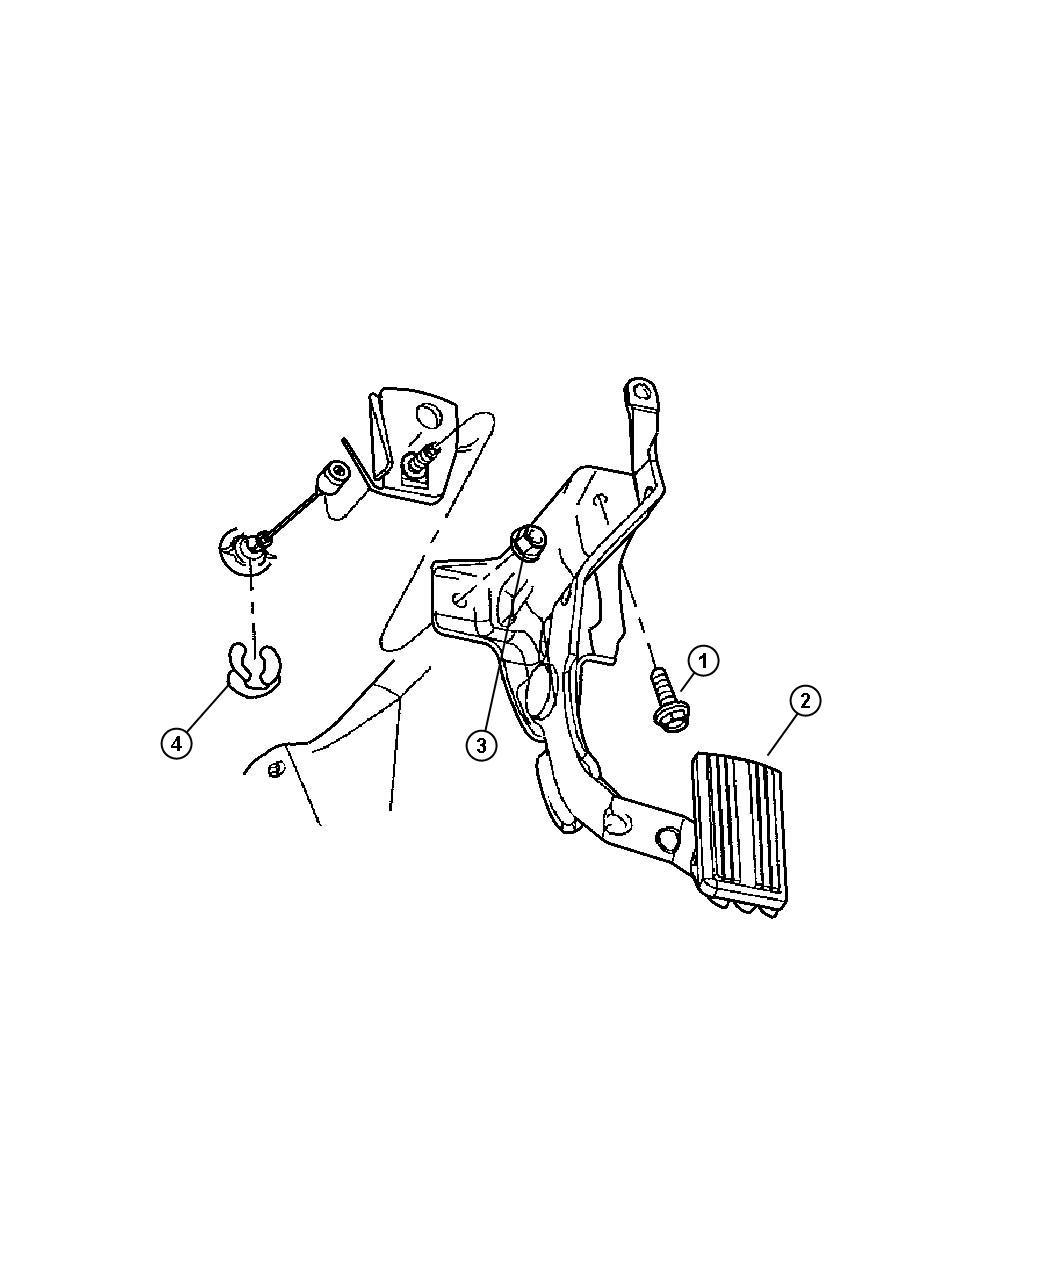 Dodge Pedal Accelerator Apps